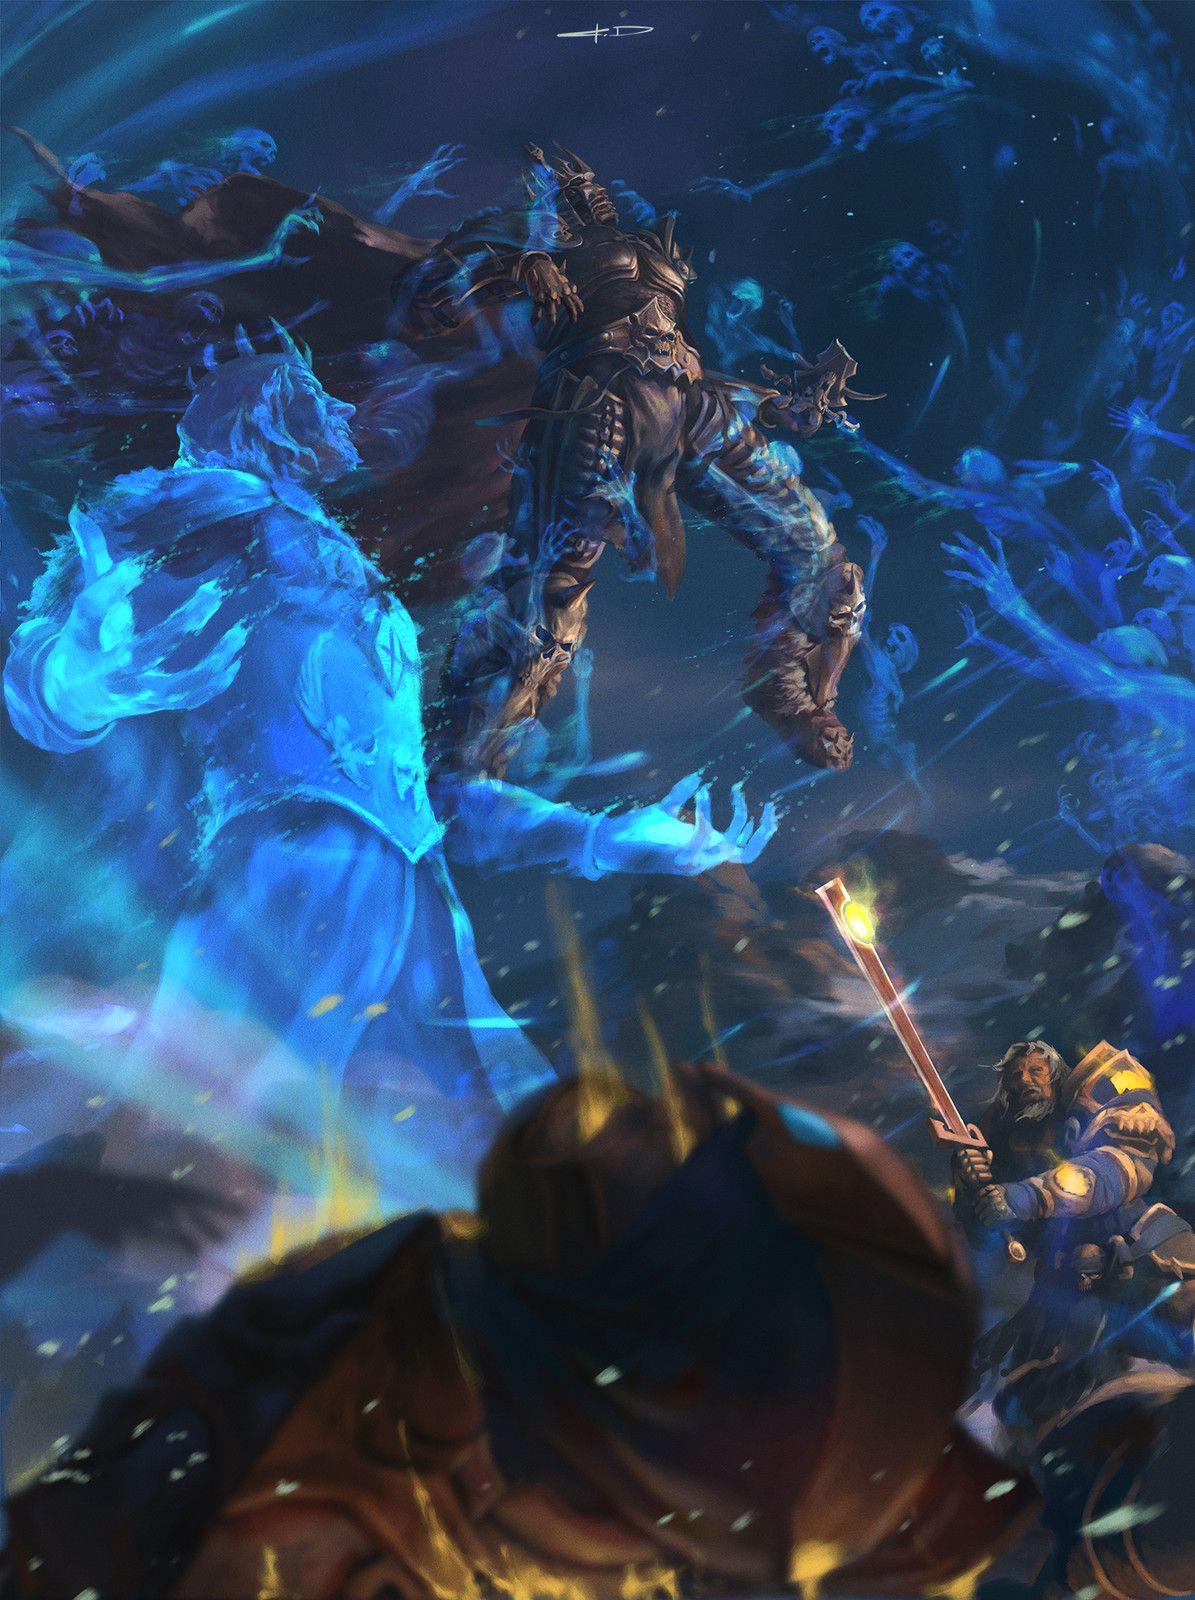 Pin By Allen Su On 場景 Warcraft Art World Of Warcraft Game